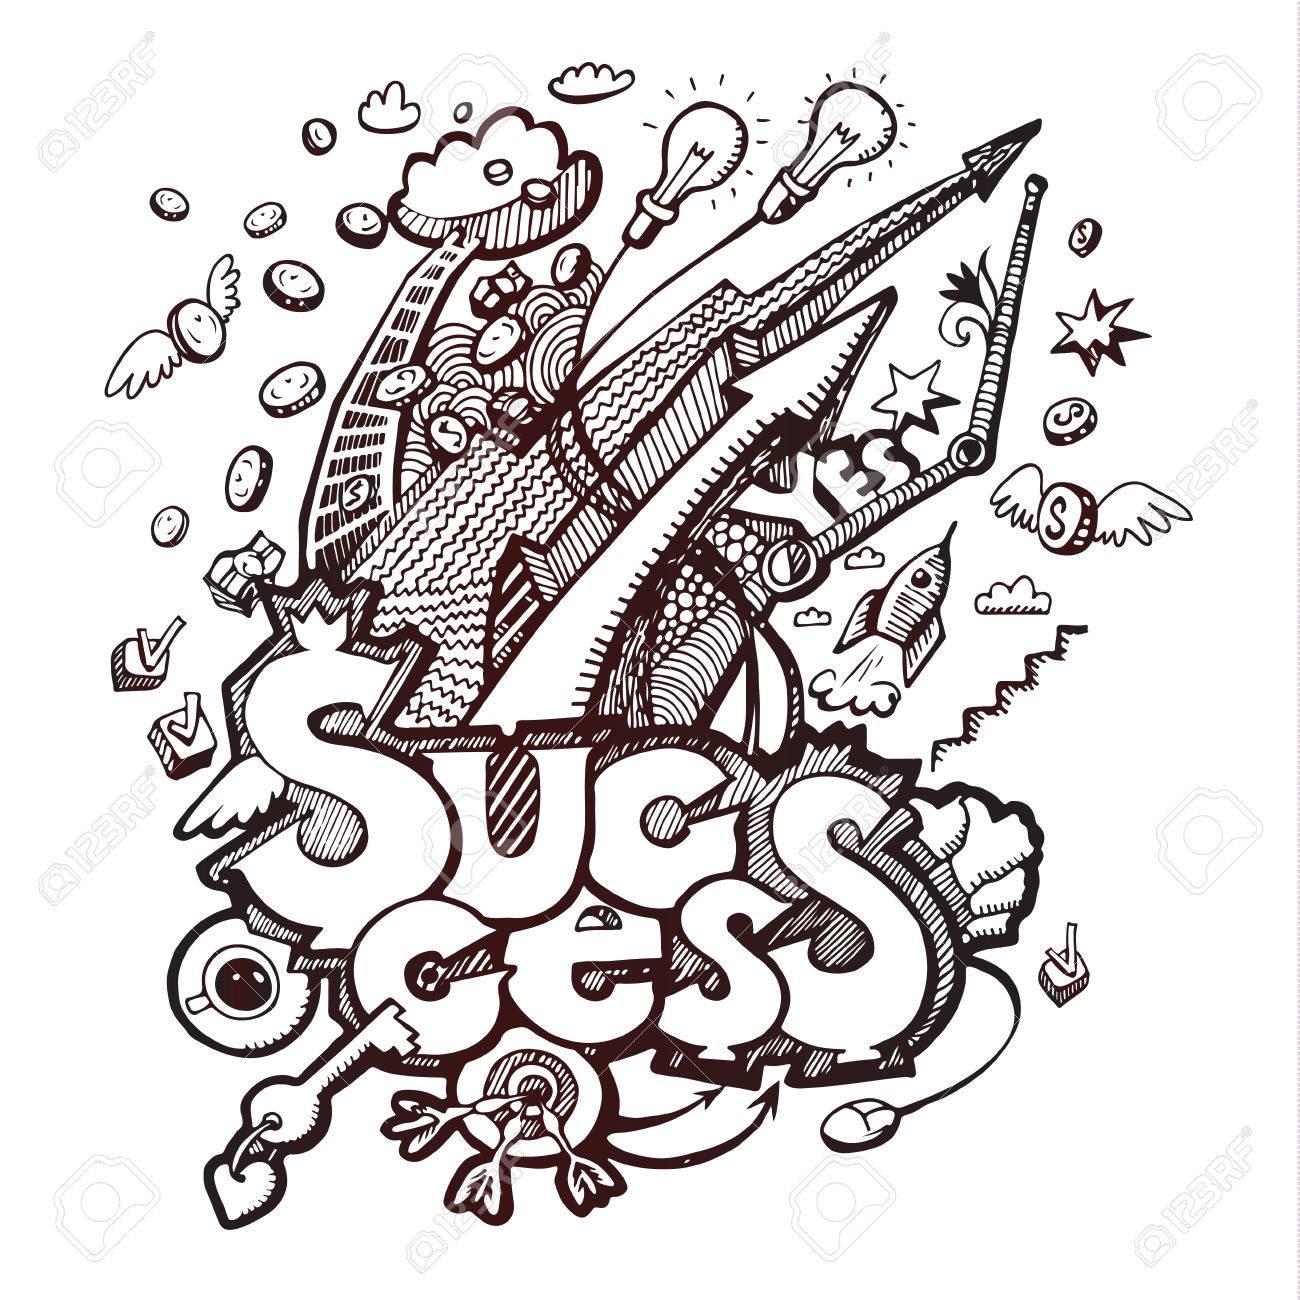 Business doodles. Concept of success. Vector illustration - 40176576